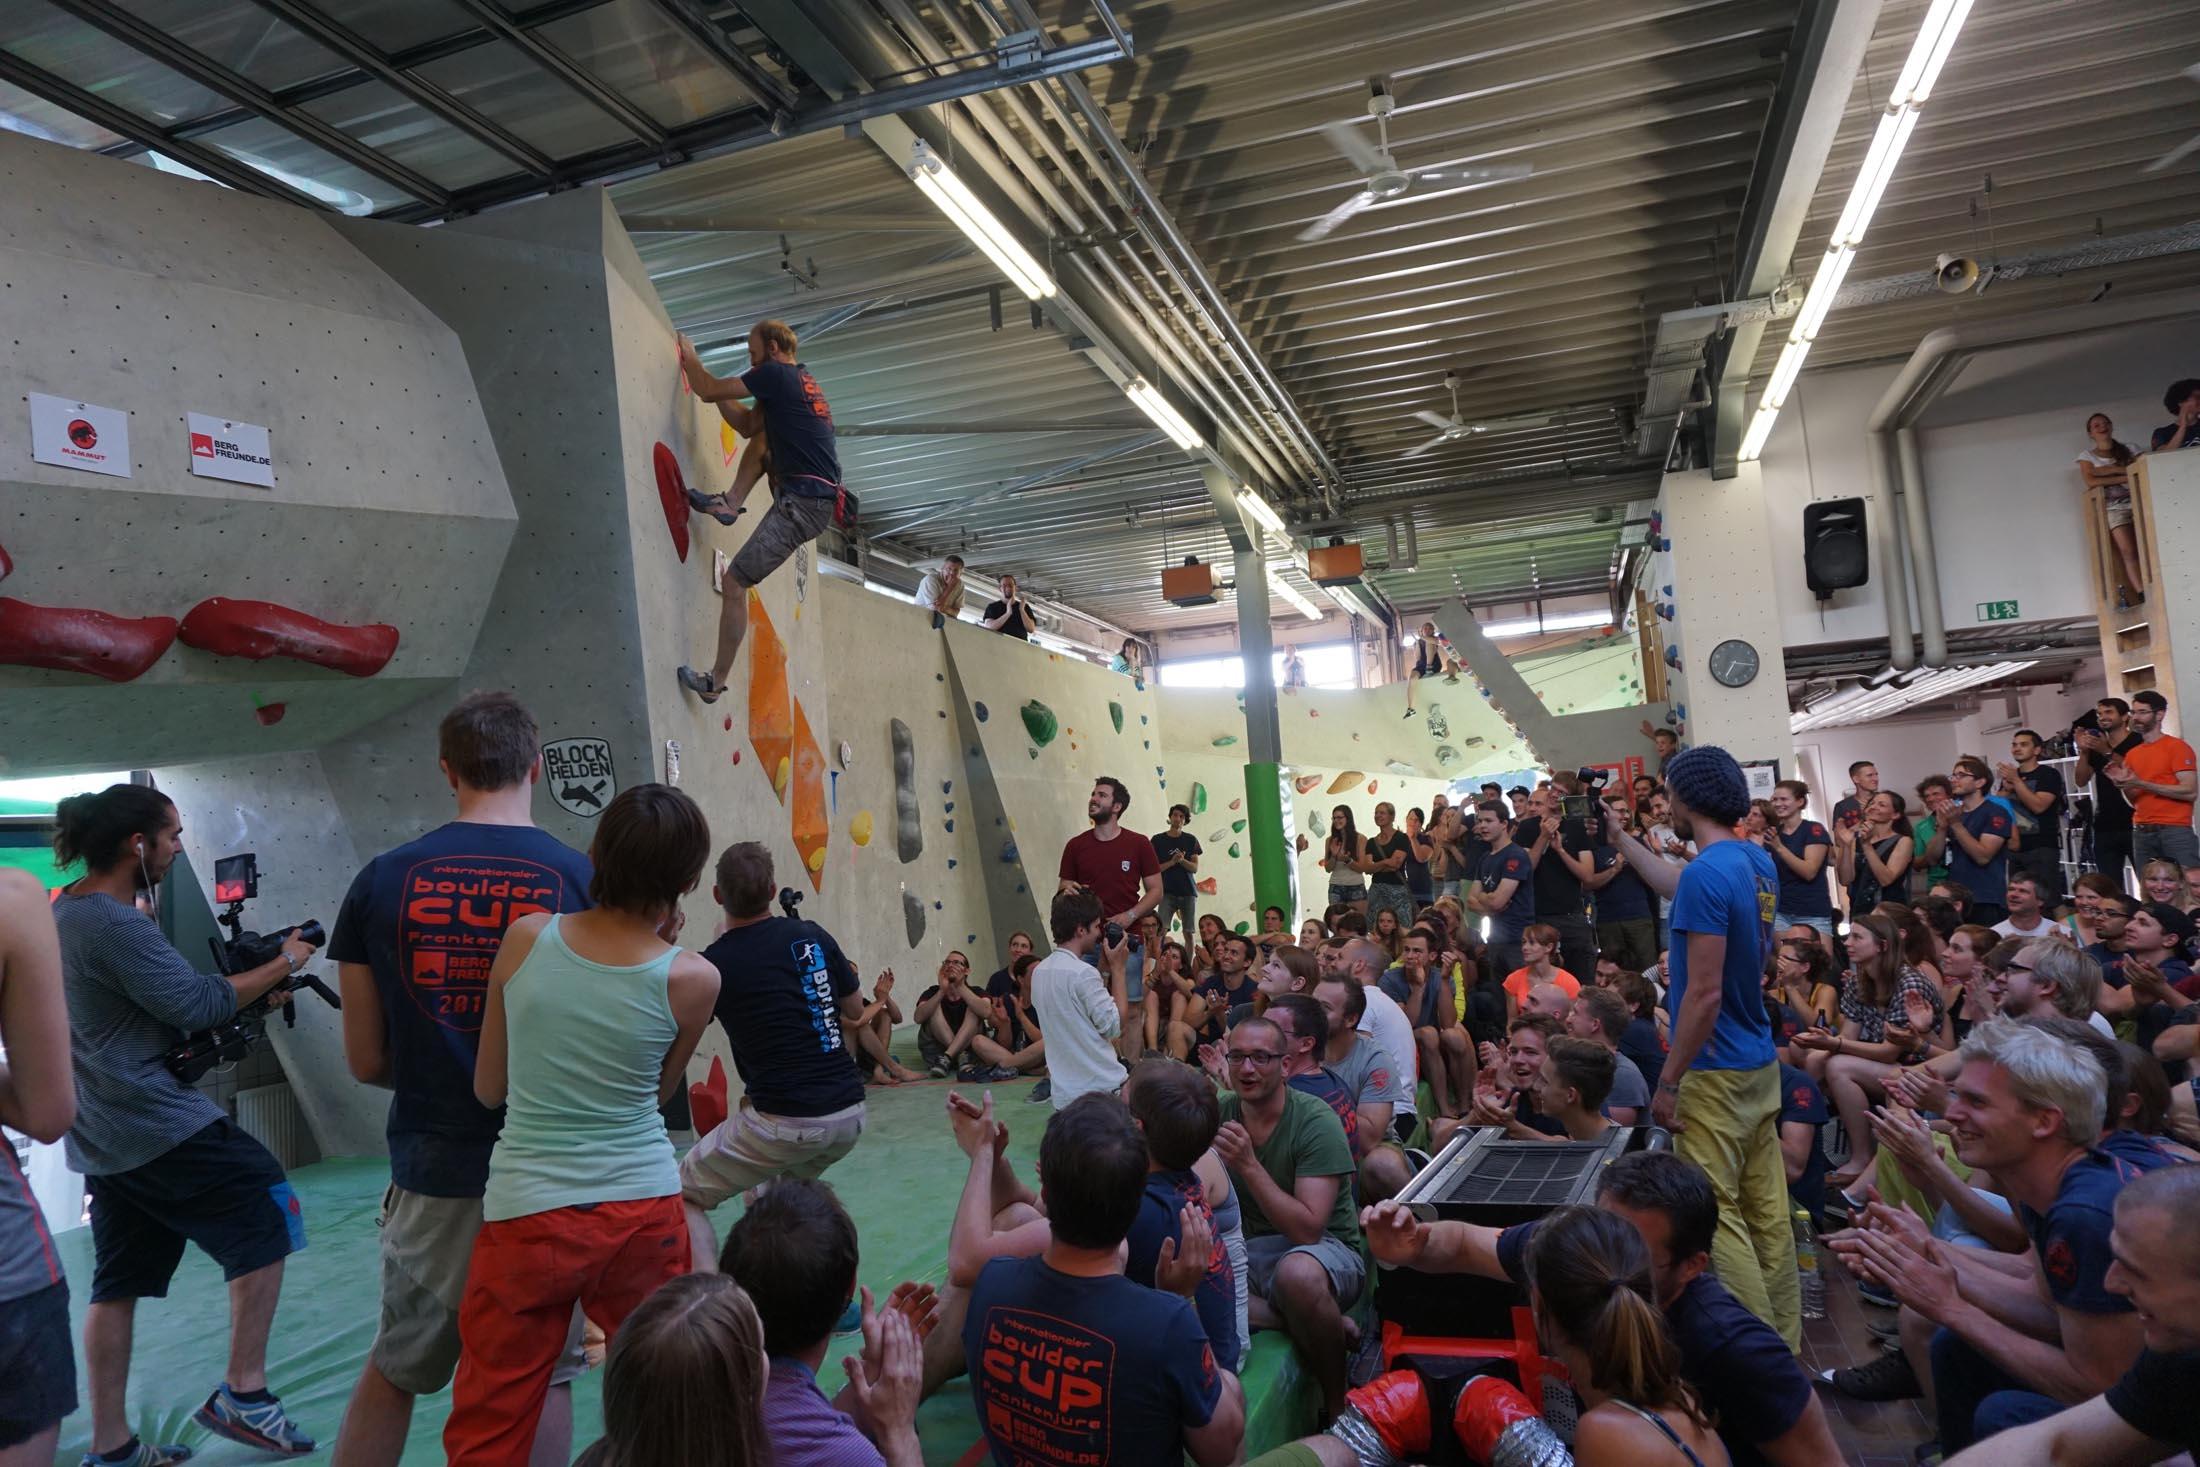 Finale, internationaler bouldercup Frankenjura 2016, BLOCKHELDEN Erlangen, Mammut, Bergfreunde.de, Boulderwettkampf07092016602